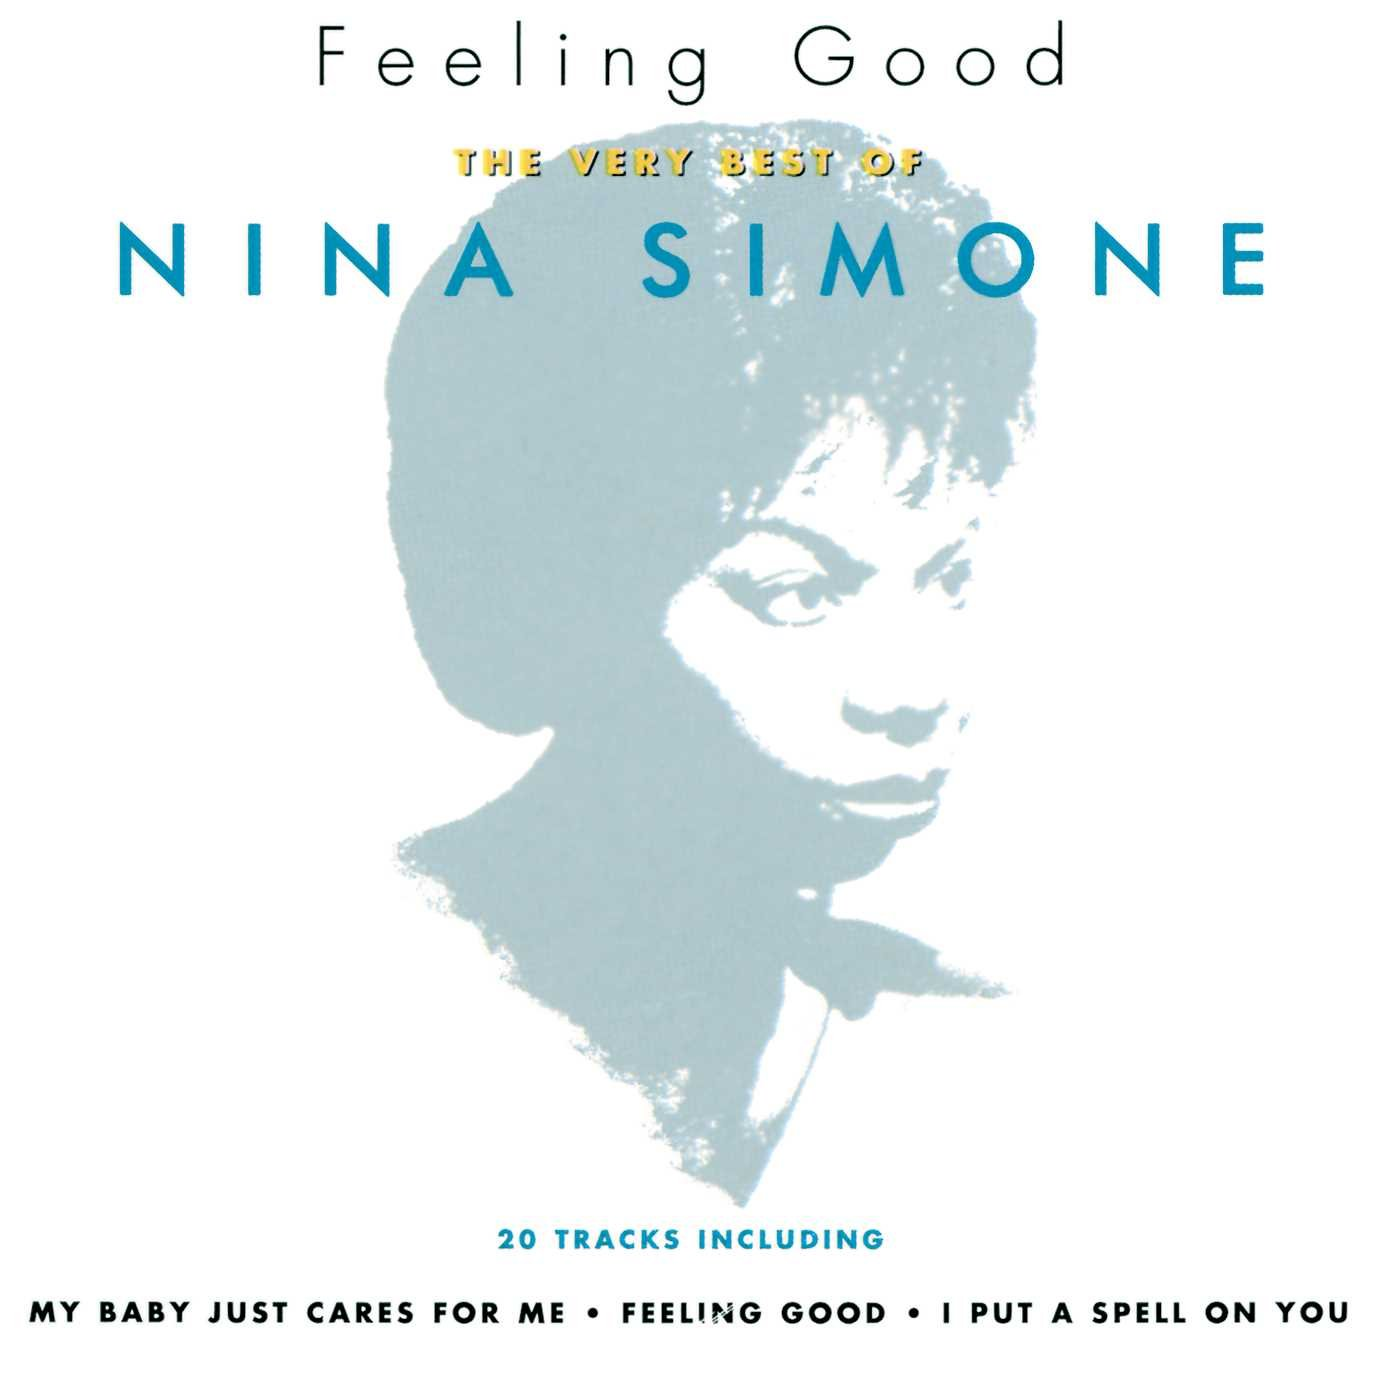 Nina Simone – Feeling Good: The Very Best Of Nina Simone (1994) [FLAC]